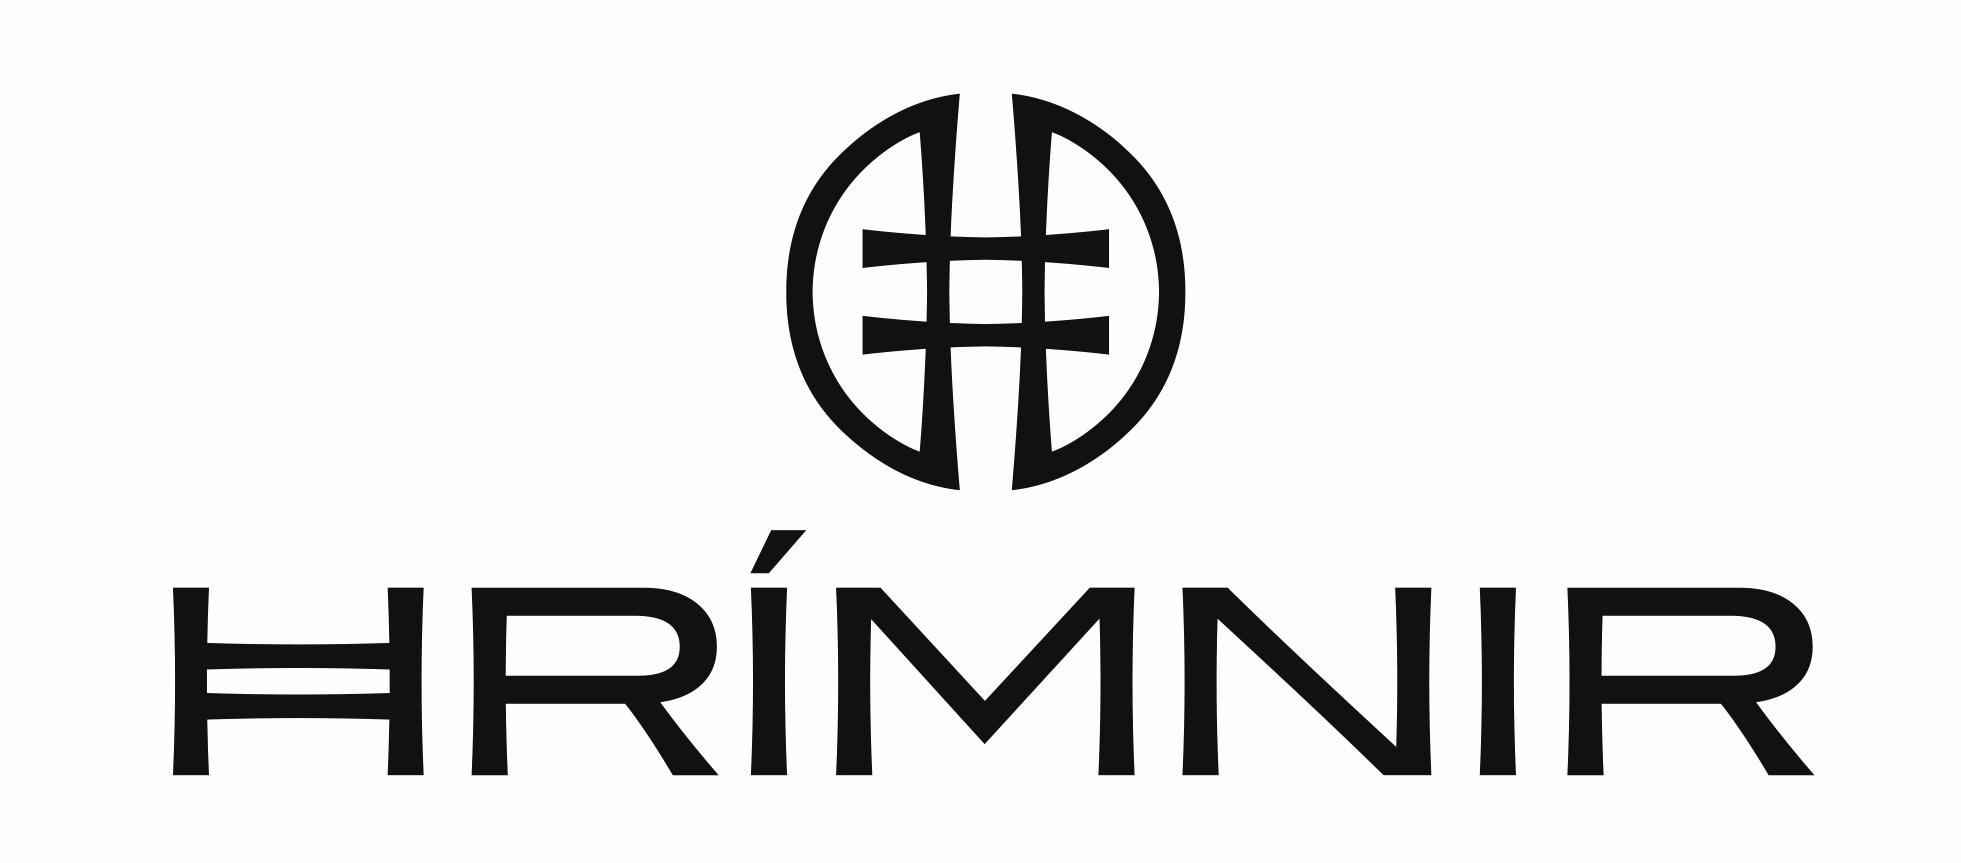 Hrimnir logo